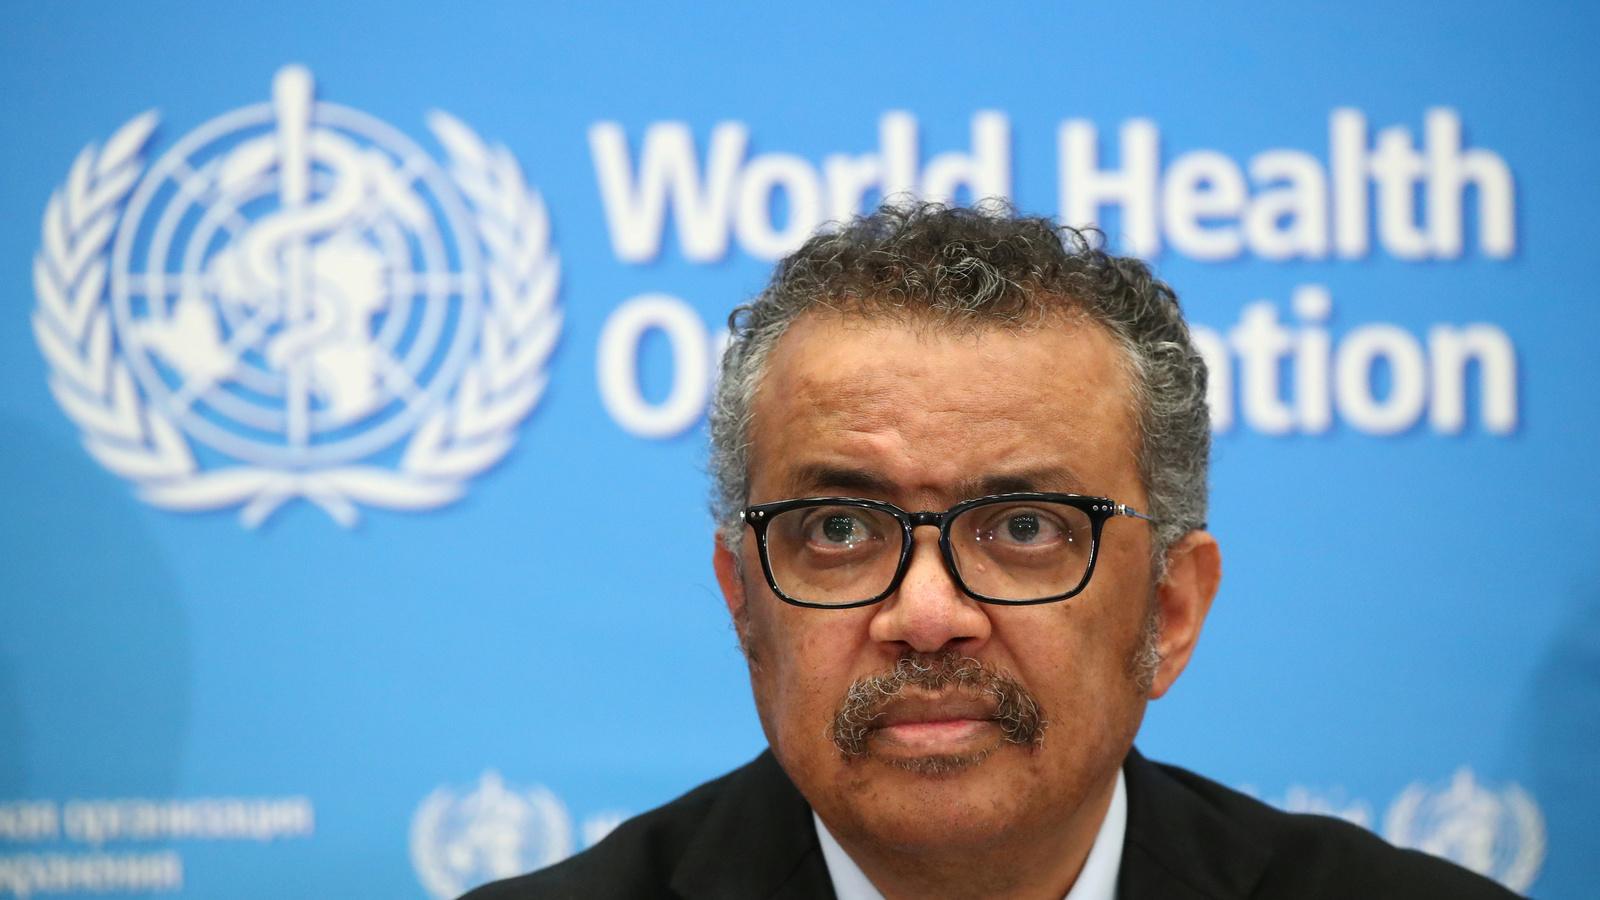 Director-General of the WHO Tedros Adhanom Ghebreyesus